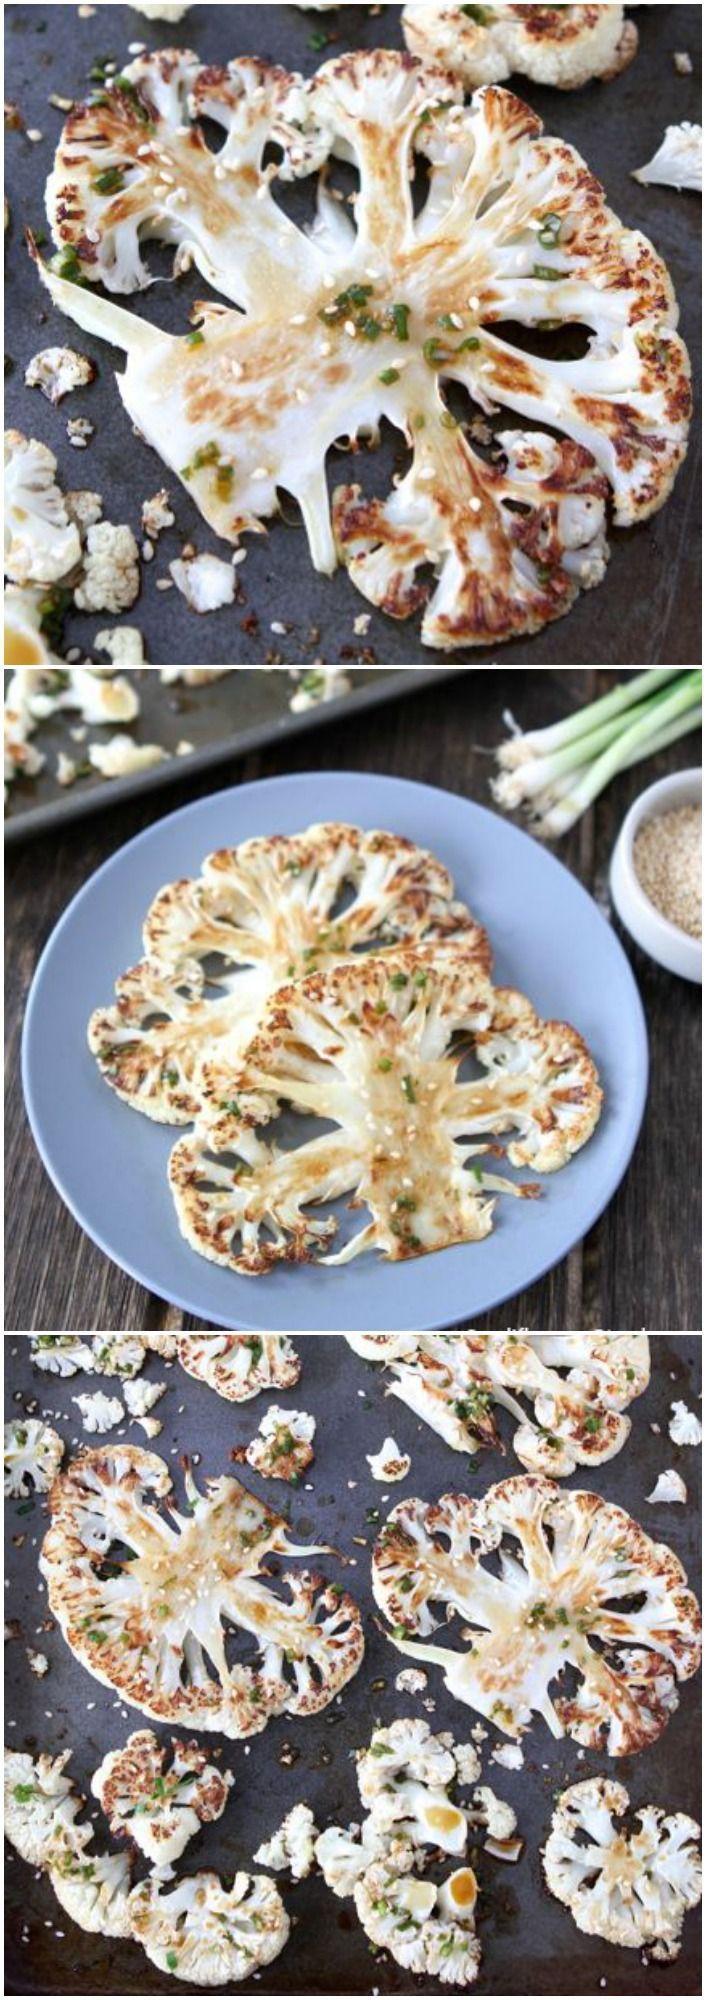 Cauliflower Steaks with Ginger-Soy Sauce | Let's EAT! | Pinterest